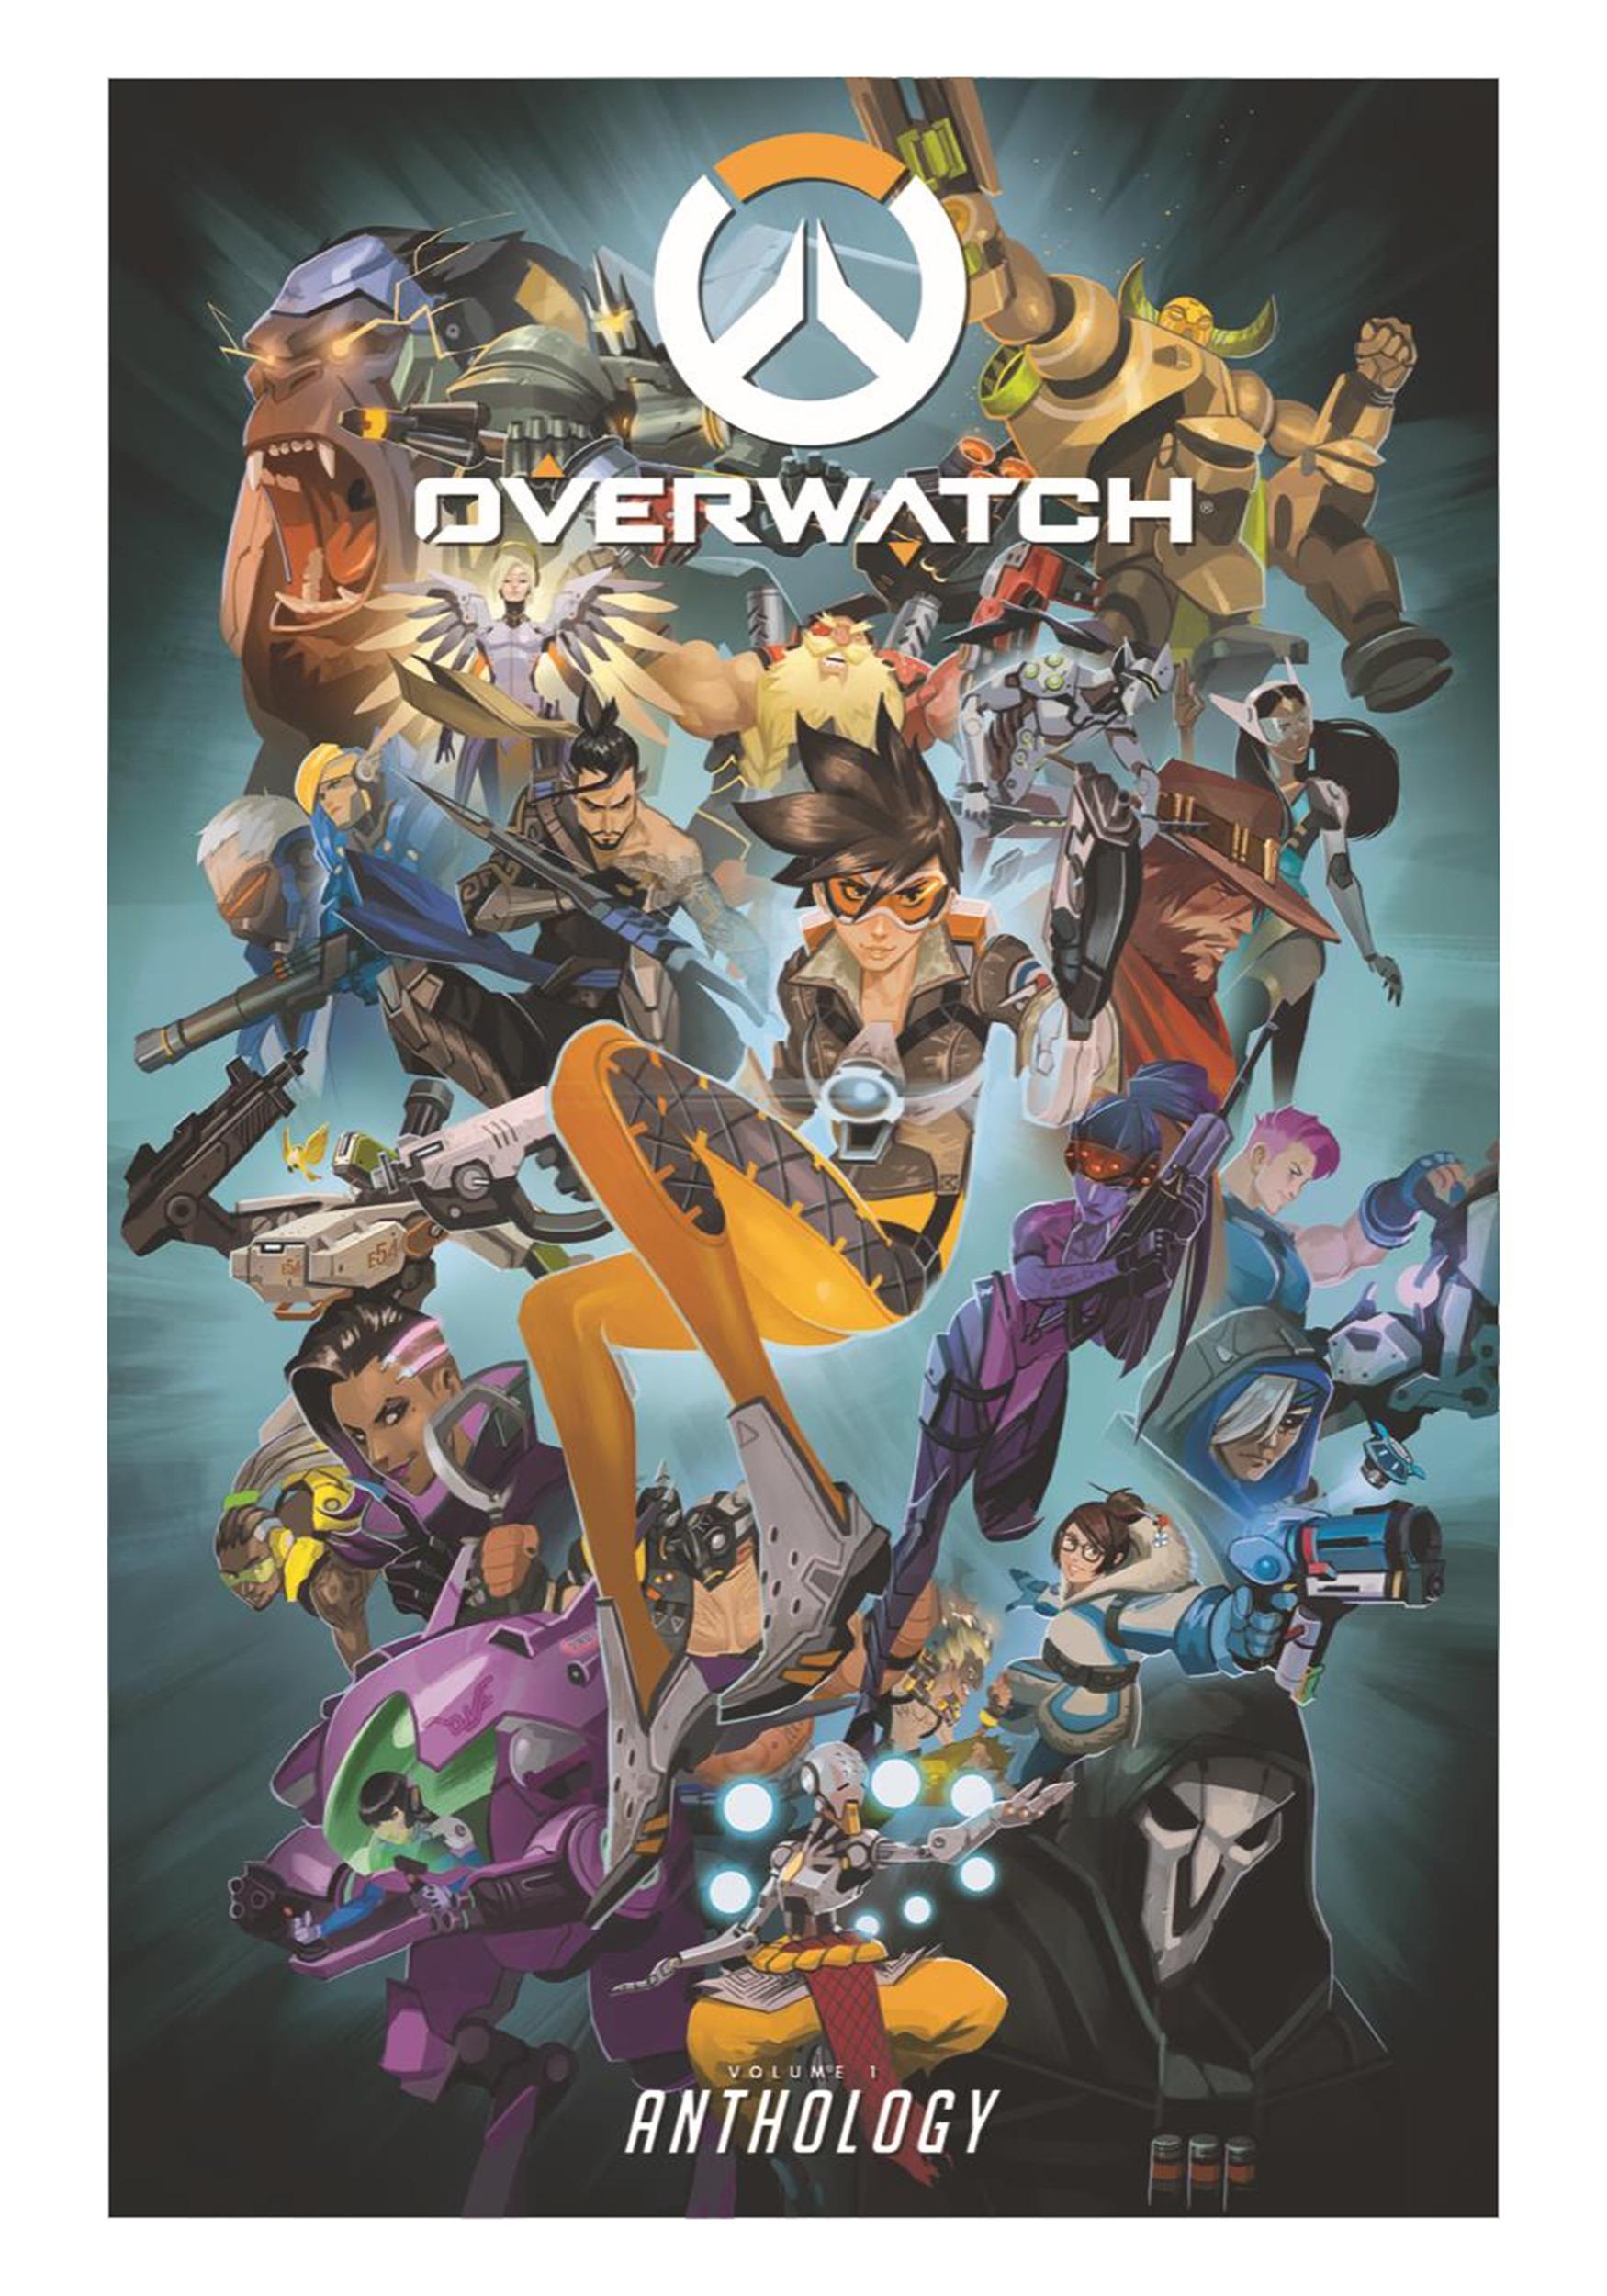 Overwatch Anthology Vol. 1